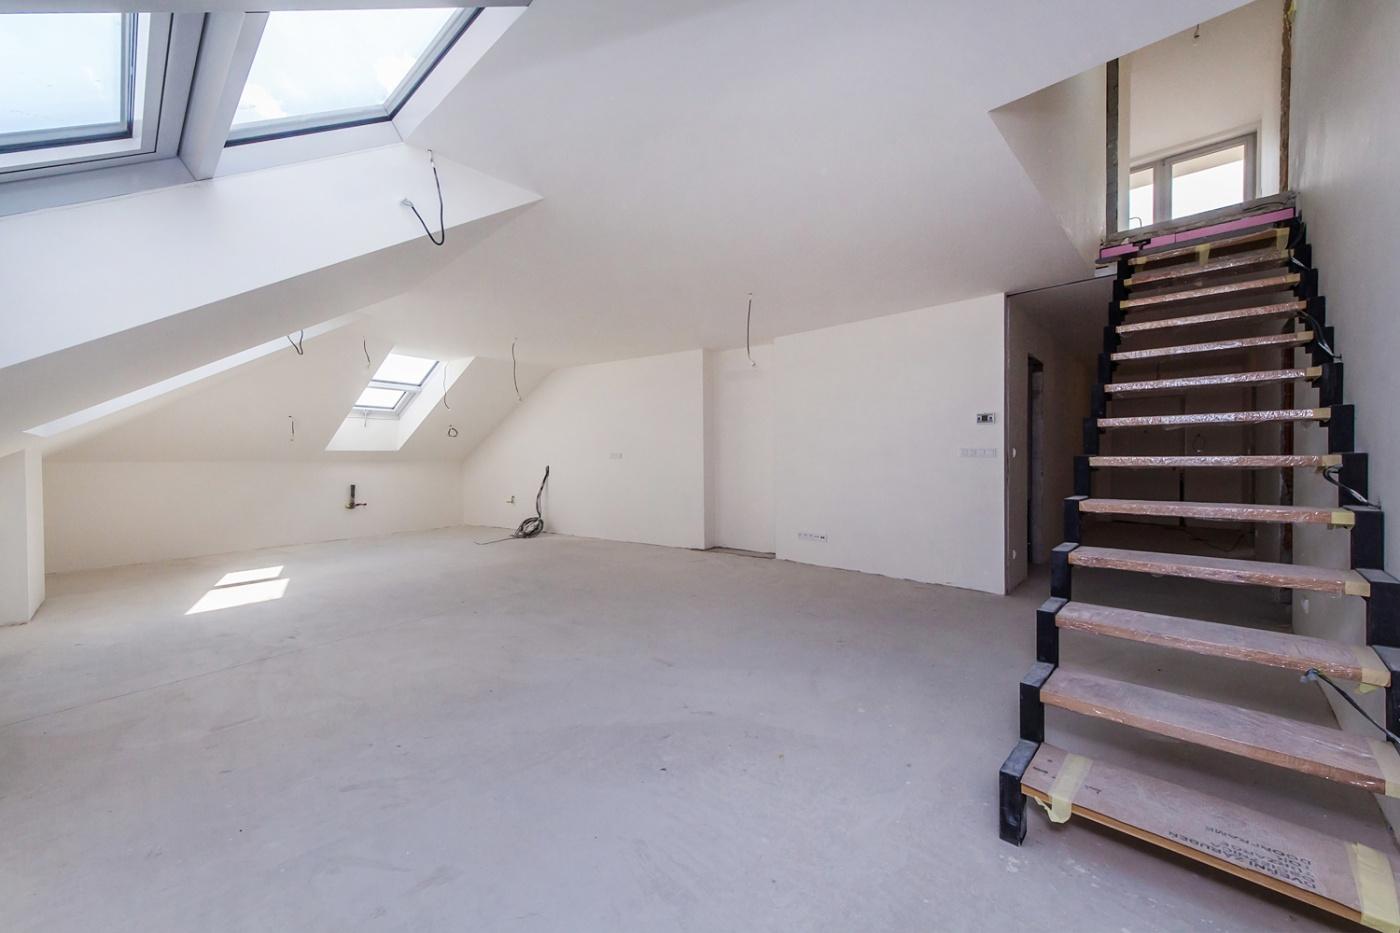 Půdní byt 4+kk, plocha 130 m², ulice Wenzigova, Praha 2 - Vinohrady | 3